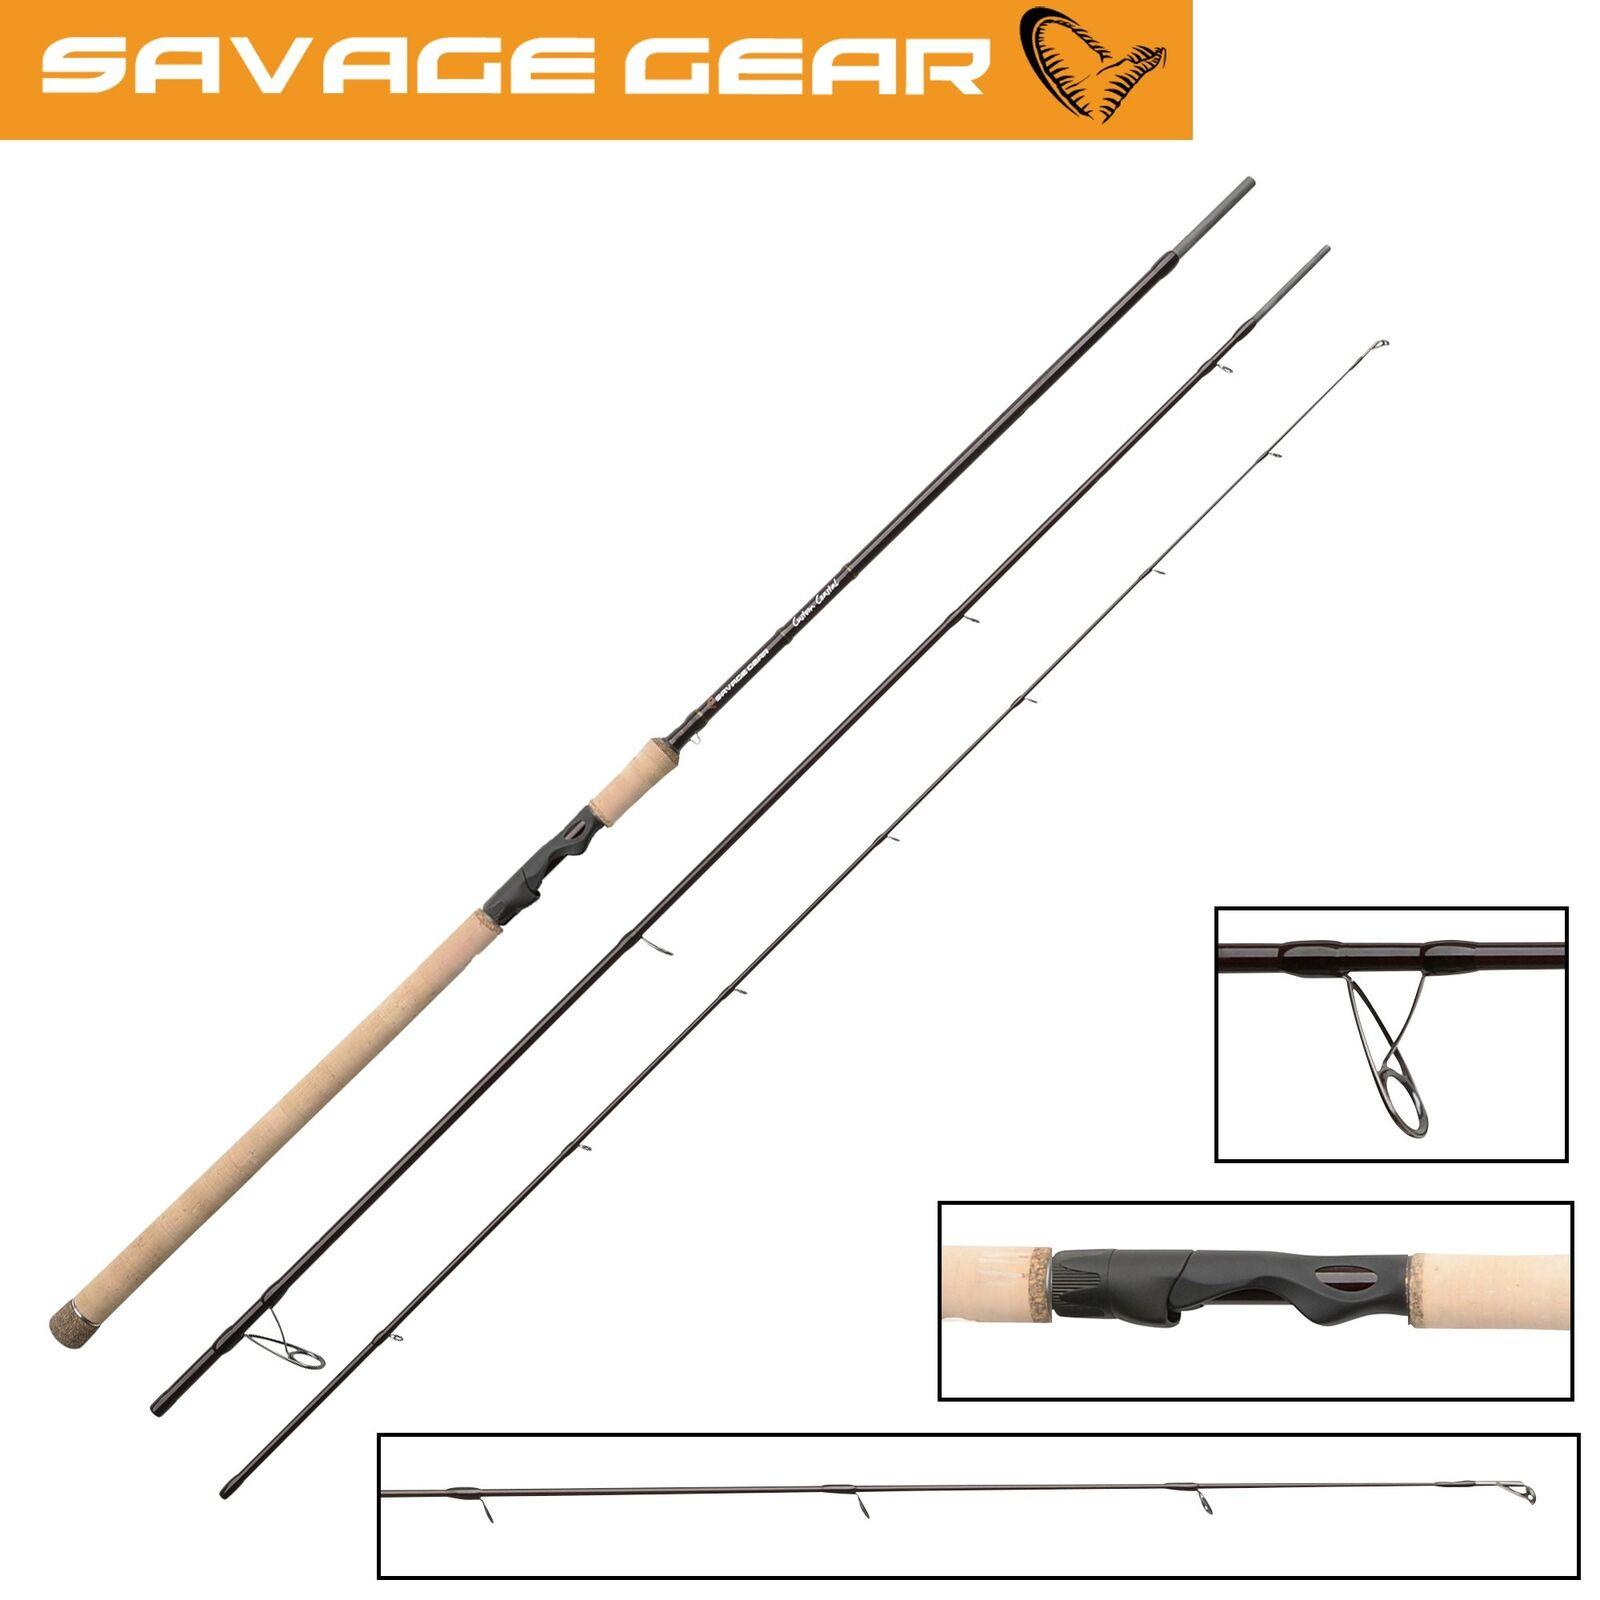 Savage Gear Custom Coastal Spin 290cm 9-27g Spinnrute zum Meeresangeln